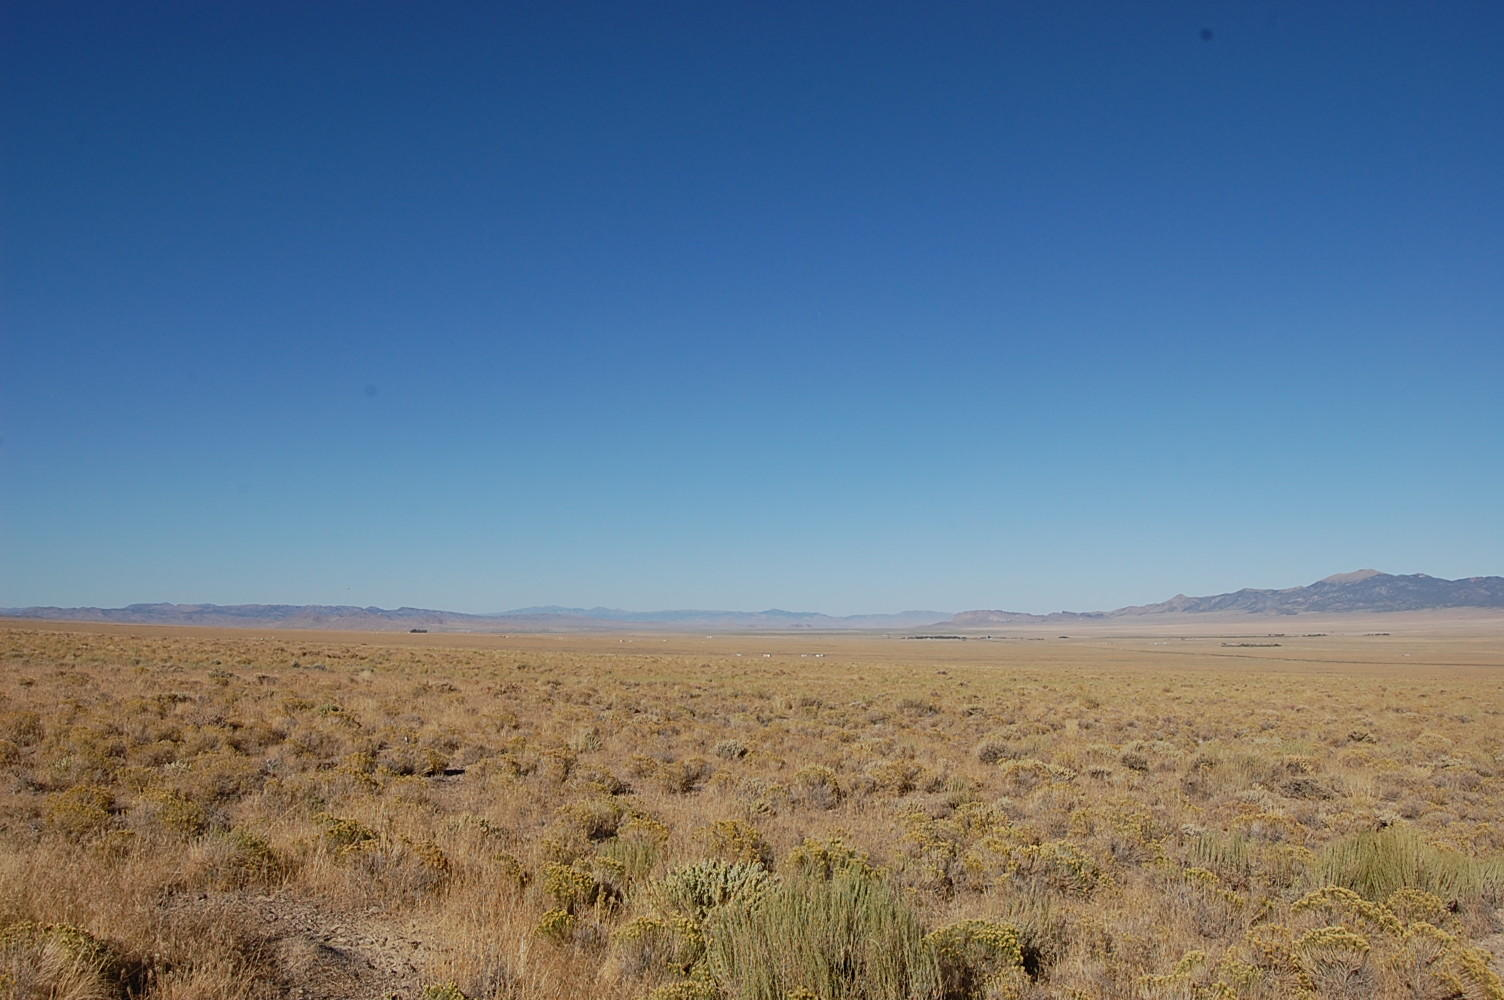 Escape into the Nevada Mountain Range on Stunning 2 Acres - Image 4